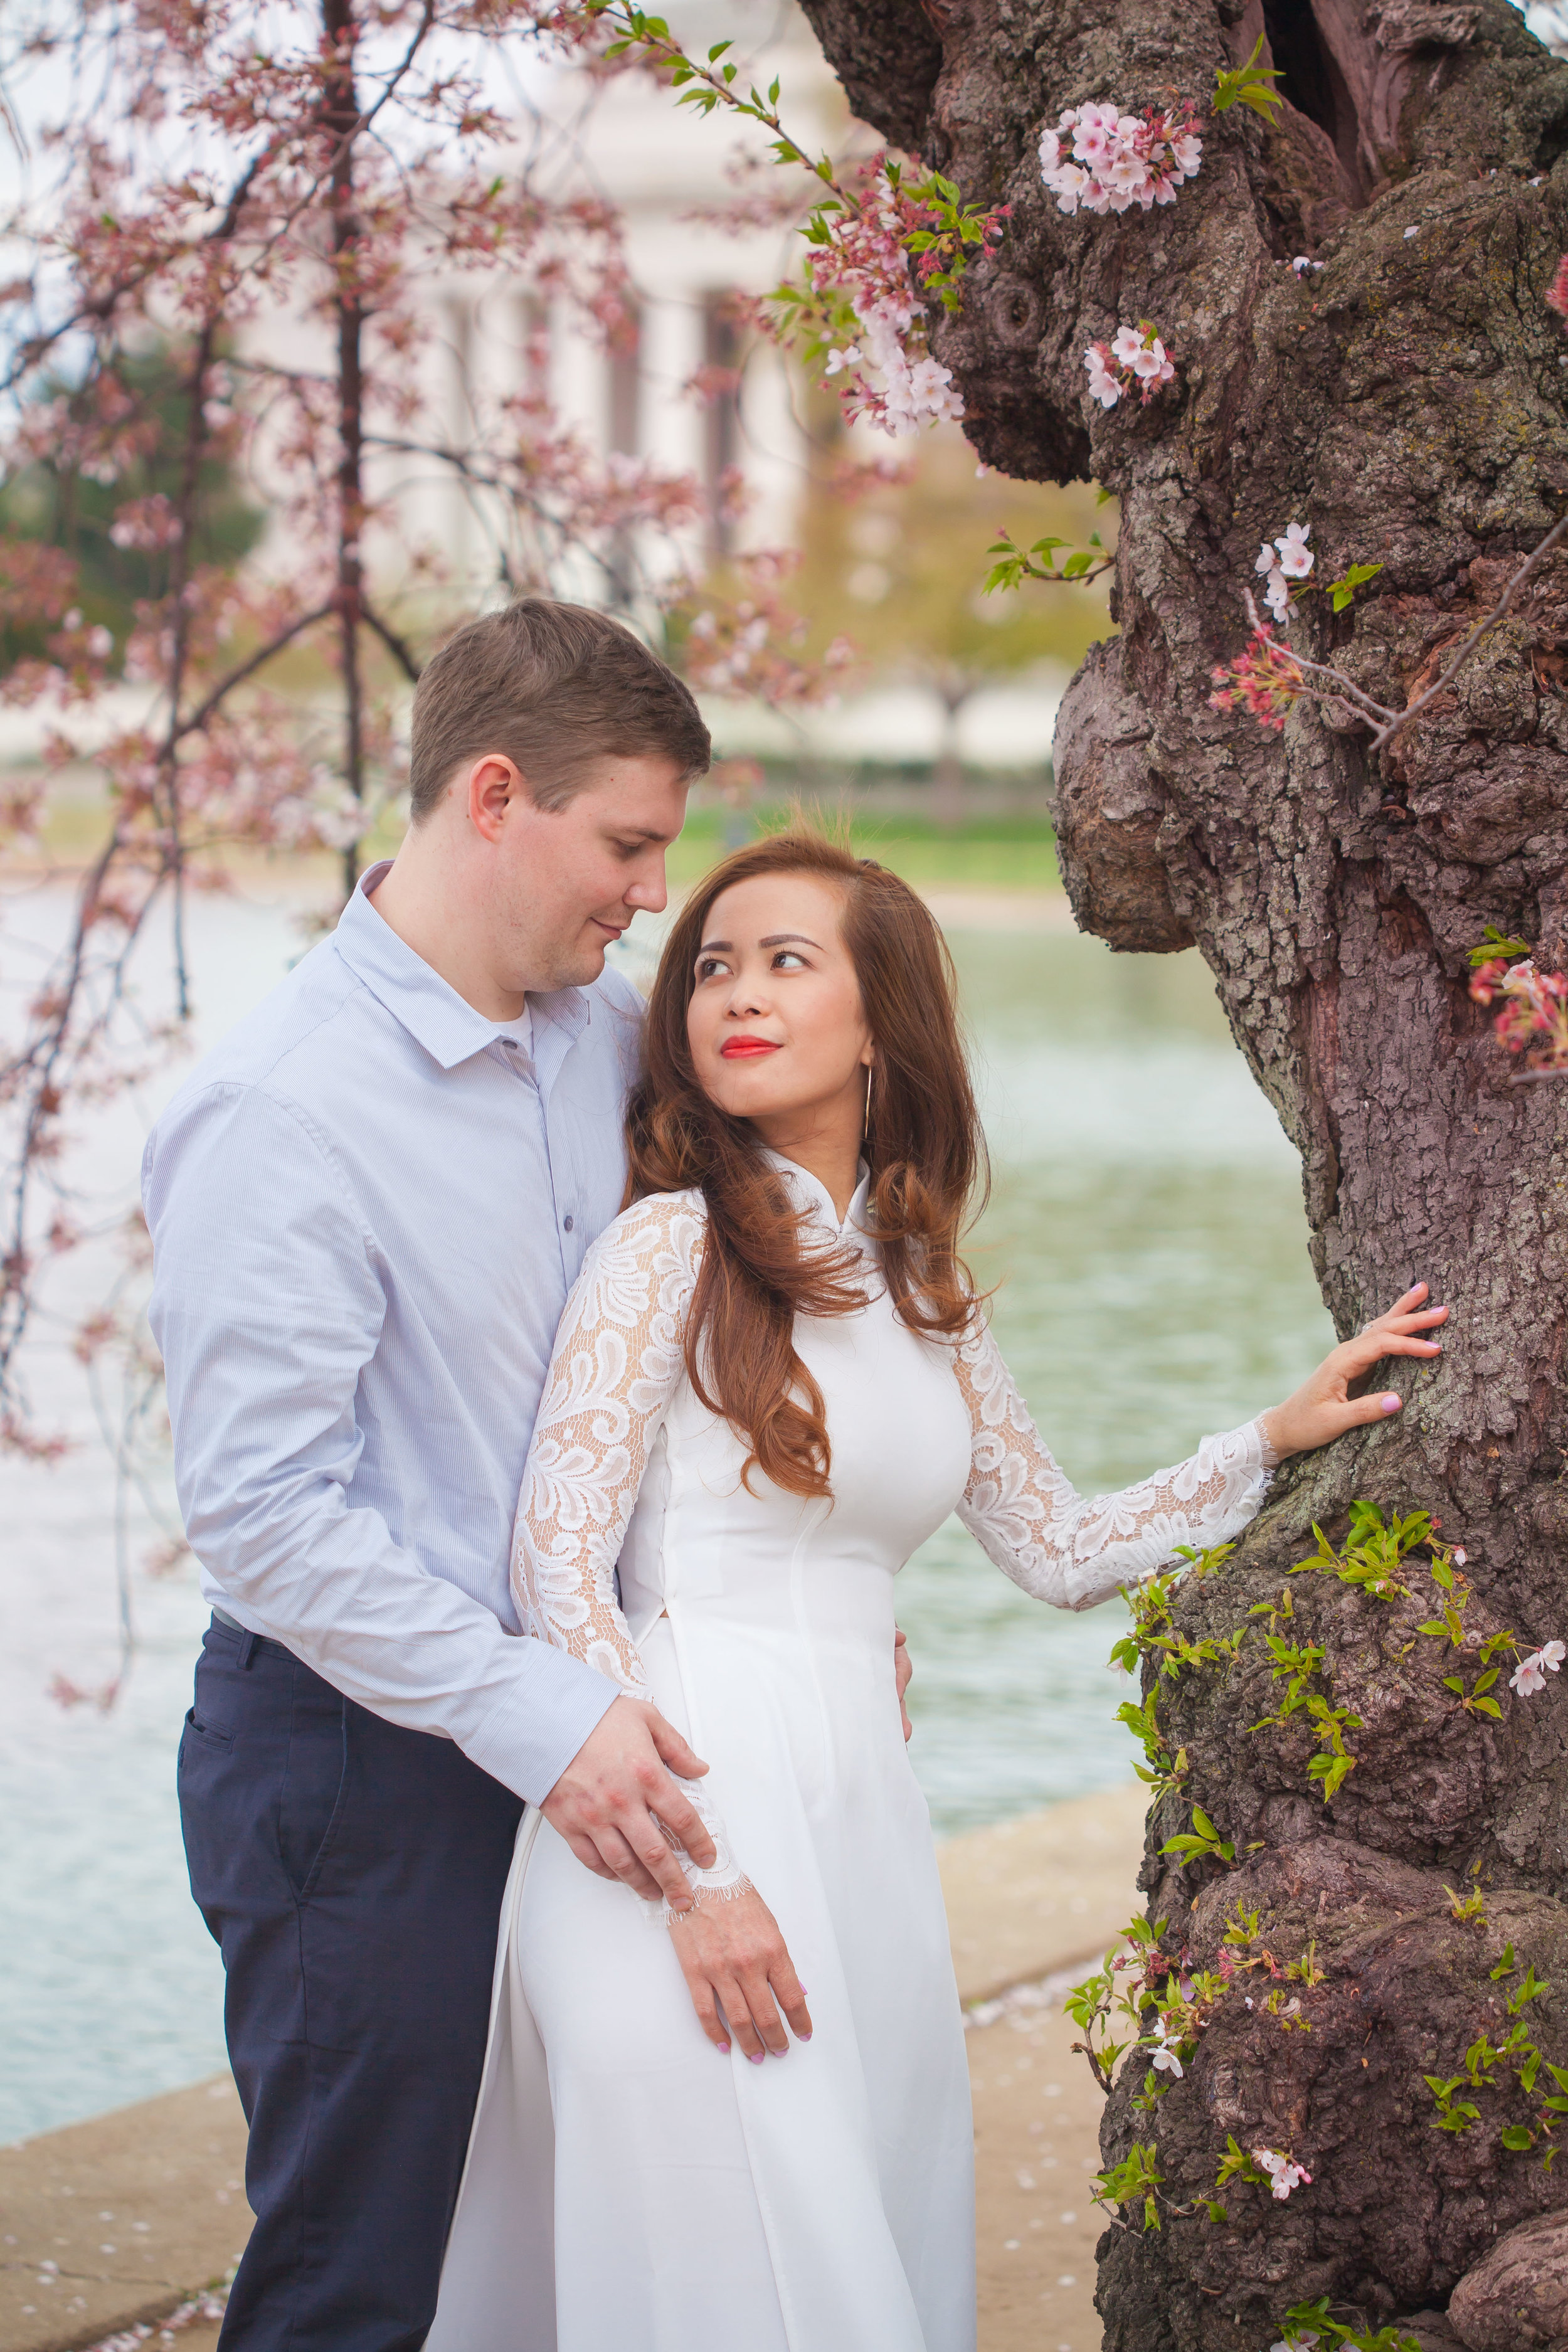 Steve & Ruby Cherry Blossom Portraits - 006.jpg